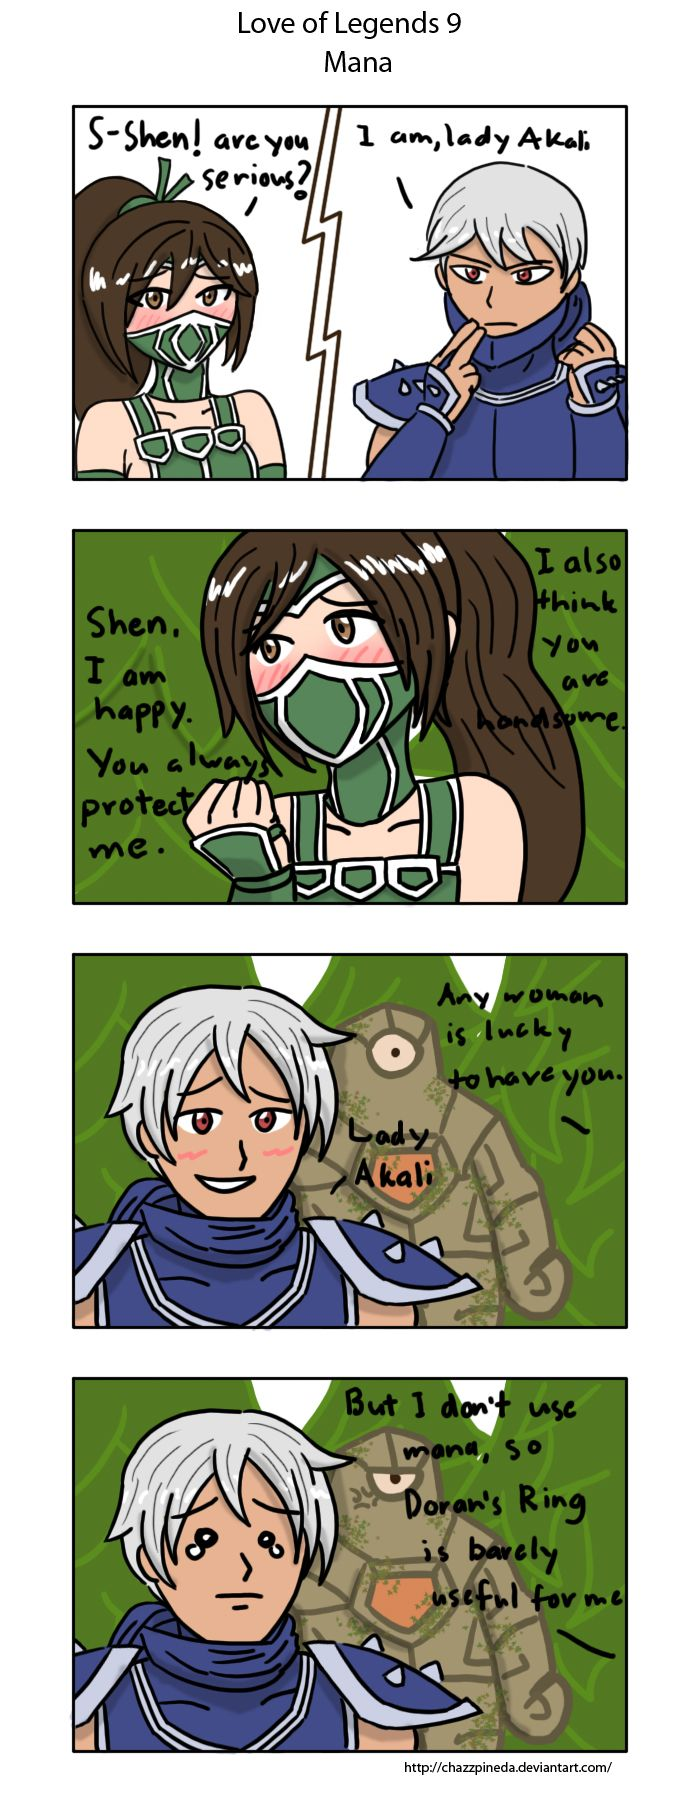 Love Of Legends 9 Mana By Chazzpineda On Deviantart Lol League Of Legends League Memes Legend